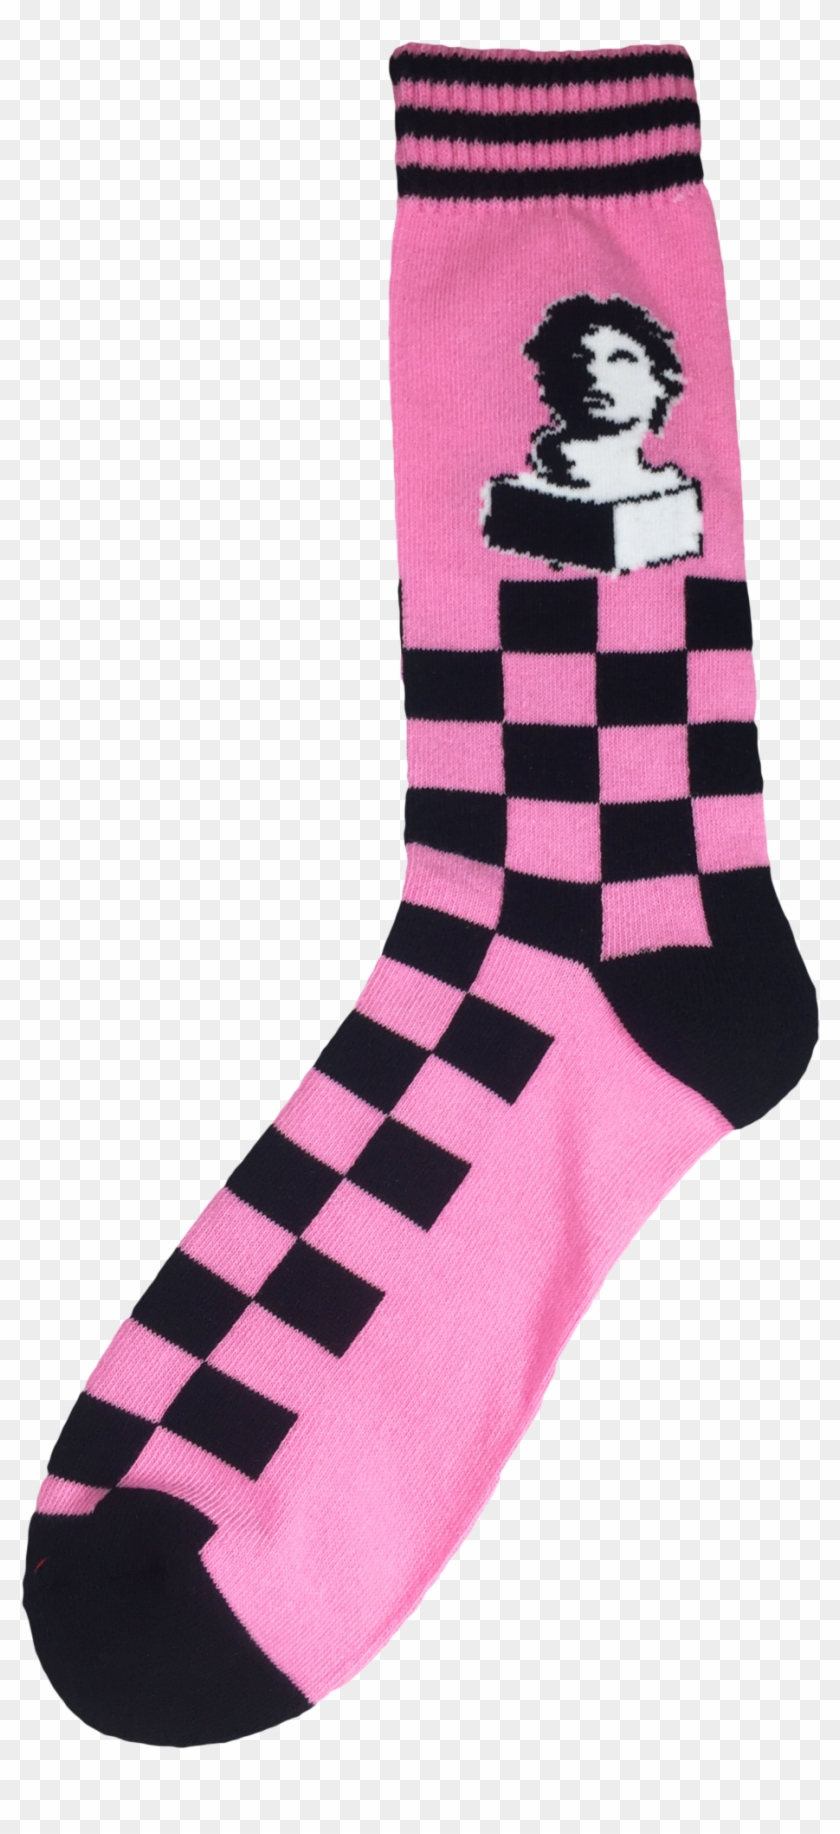 Vaporwave Aesthetic Macintosh Plus Crew Sock Clipart 4107032